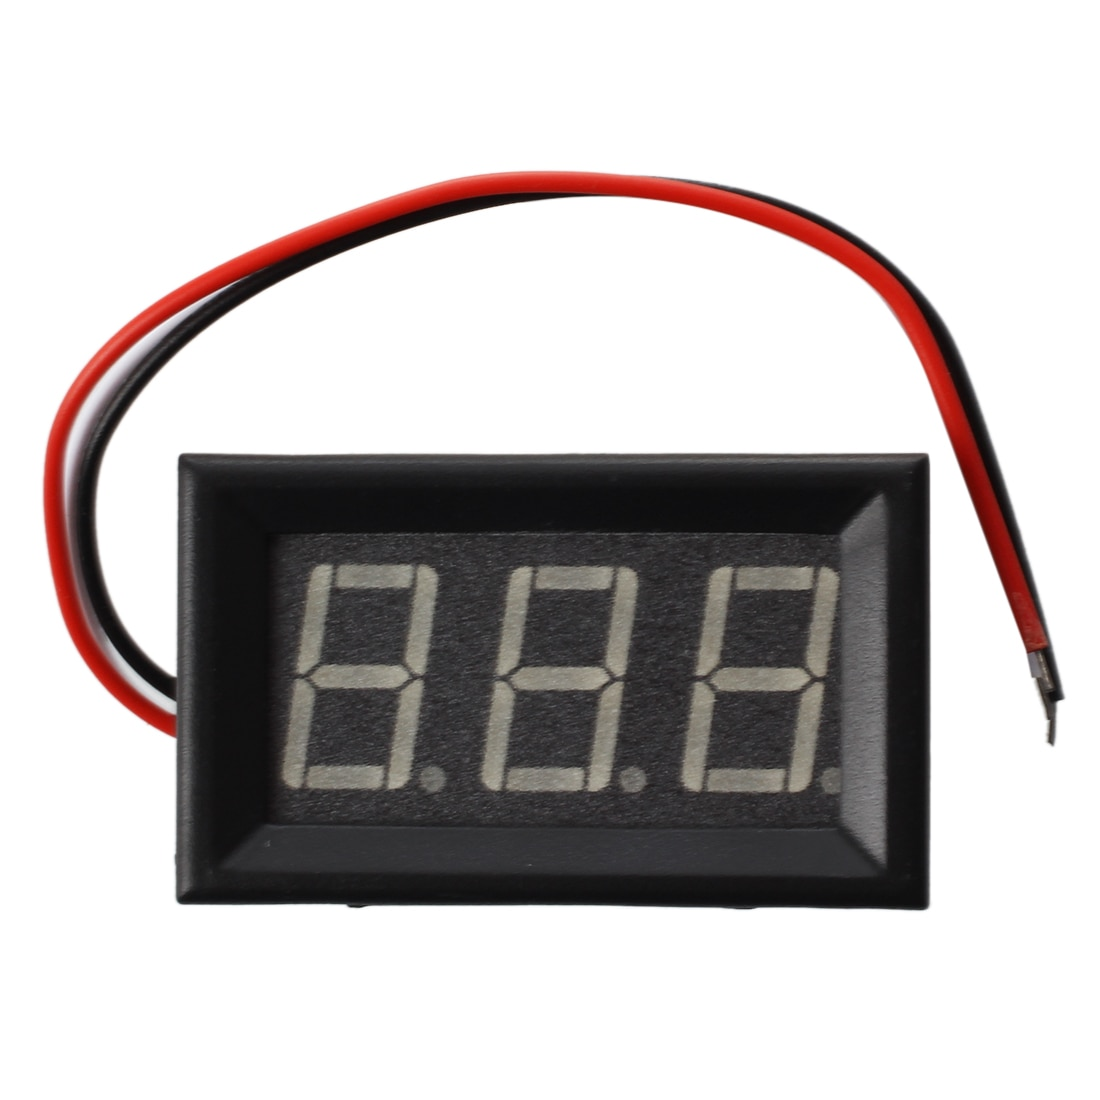 ¡El mejor precio! Mini voltímetro de voltaje del panelímetro DC 0 - 200 V 20 mA amarillo tres Cables